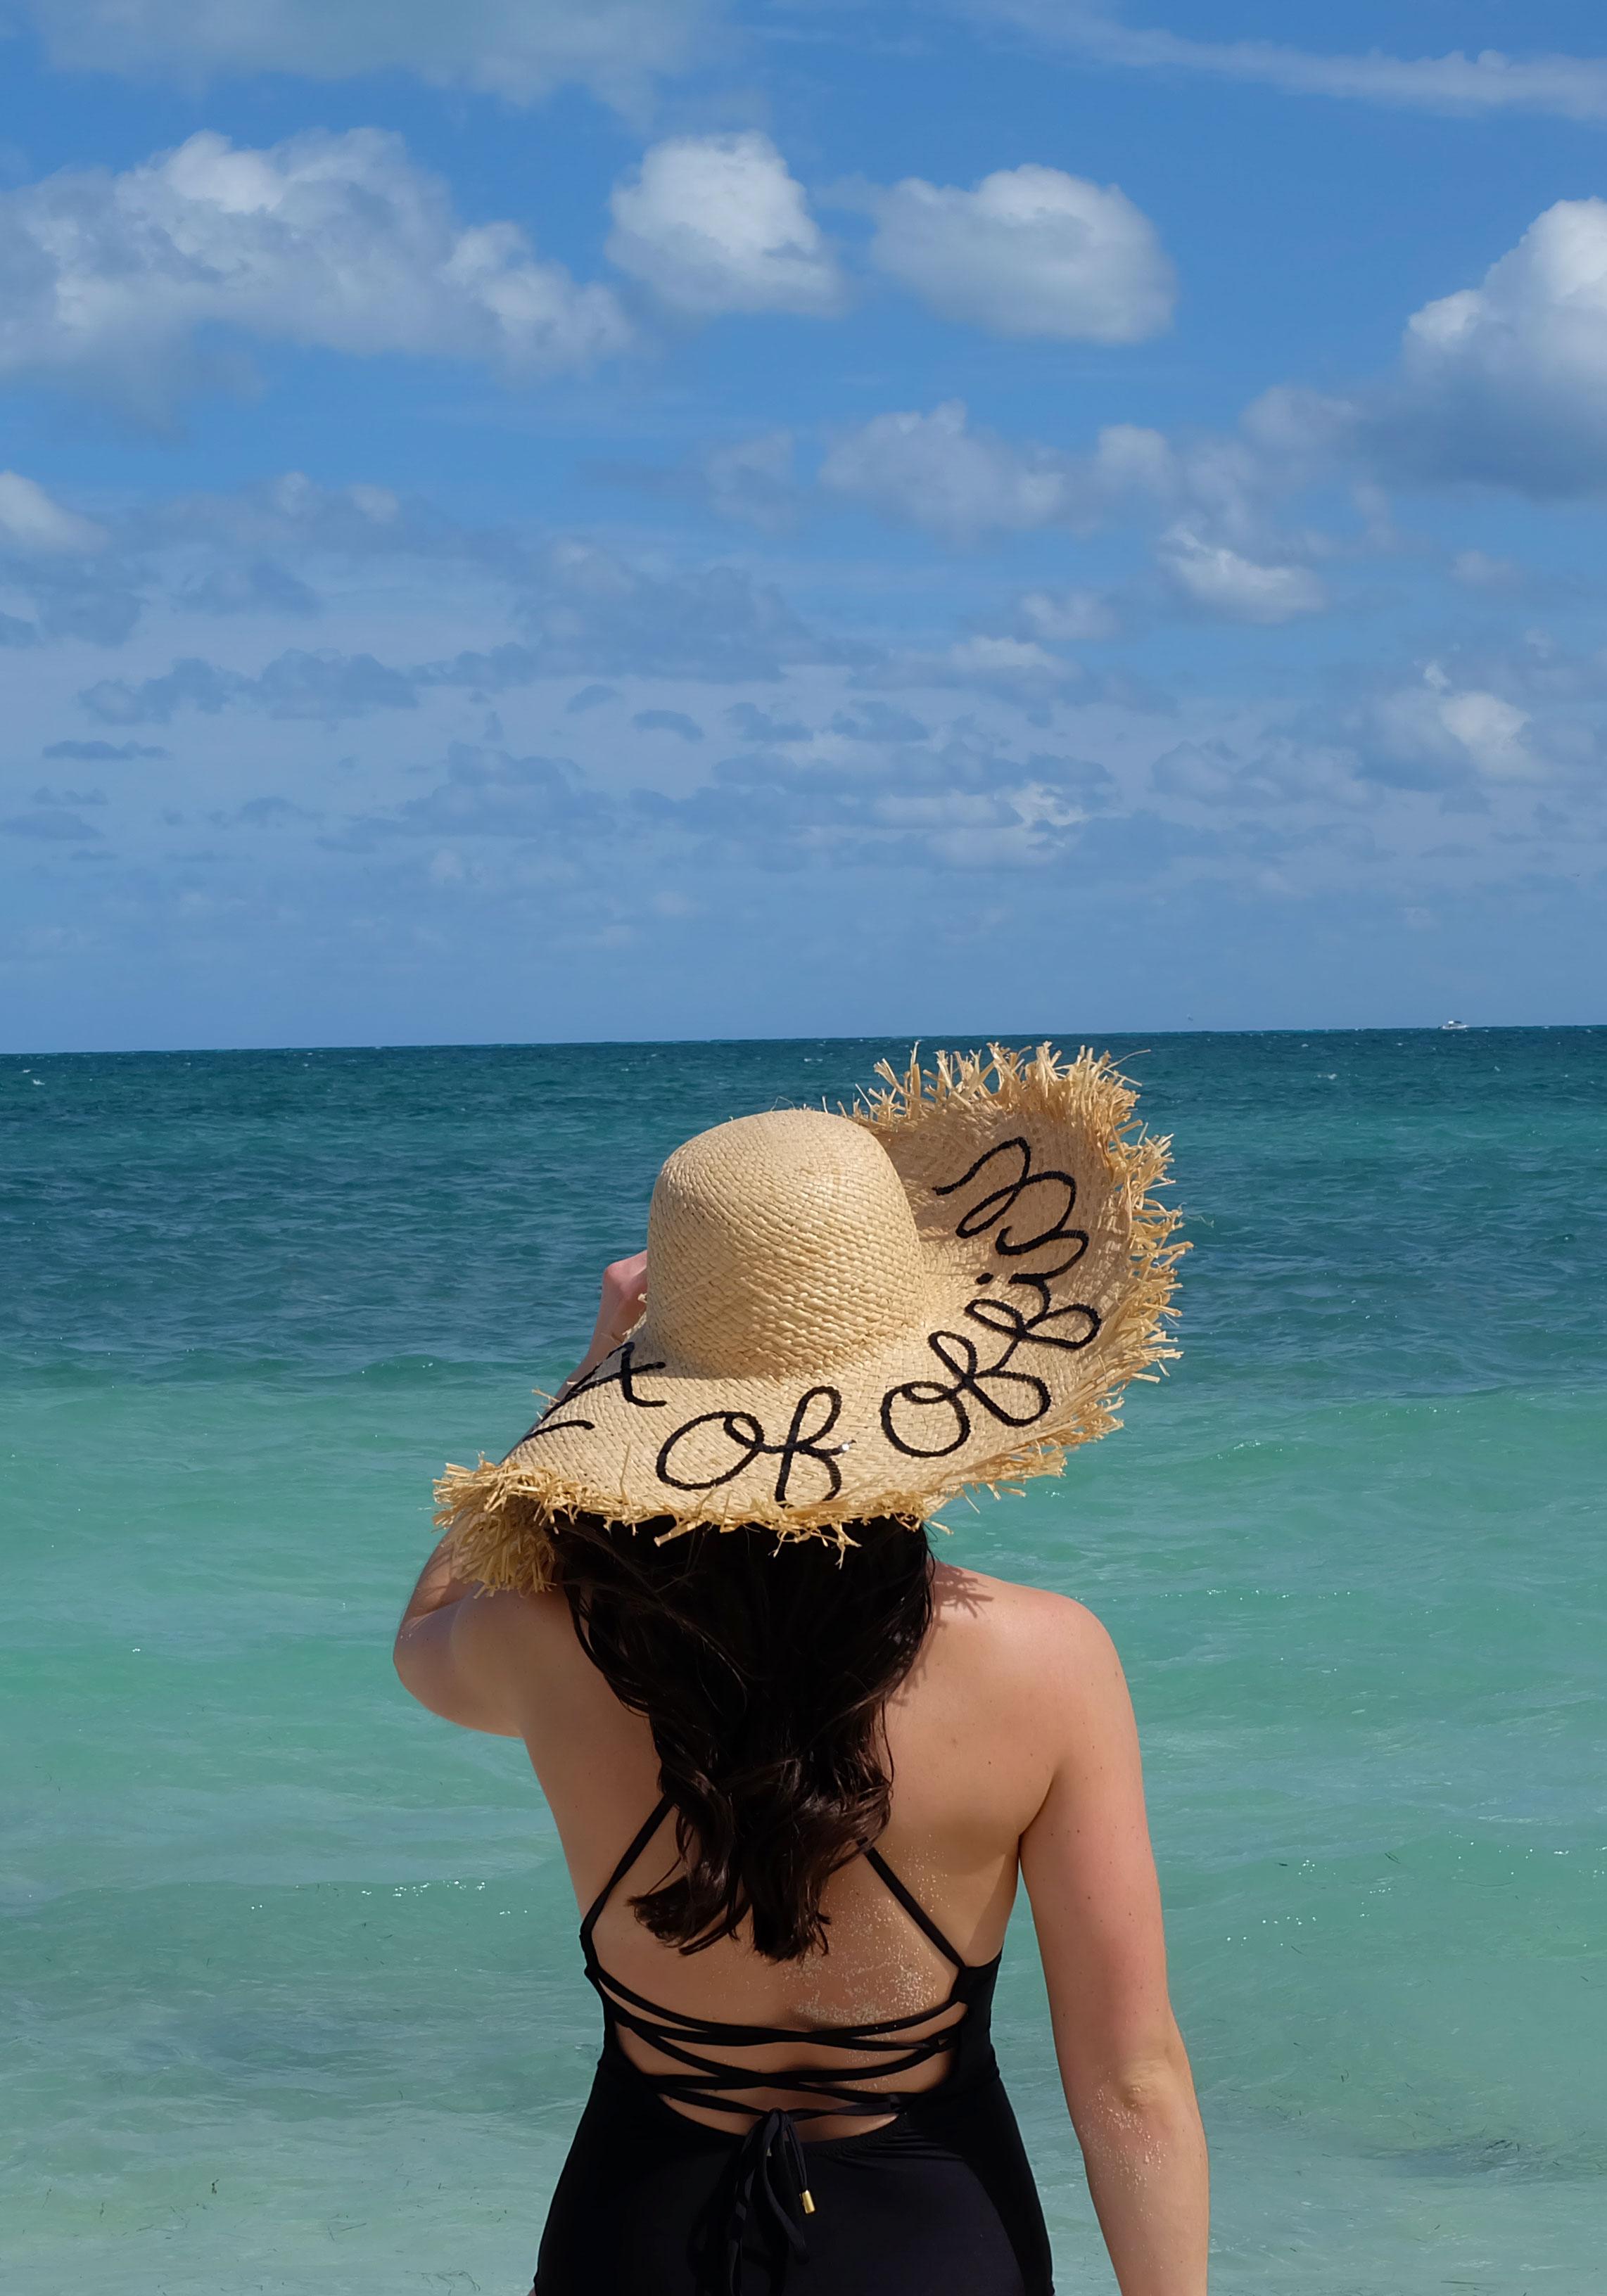 Helen Jon One Piece Lattice Back Swimsuit, Cute One Piece Bathing Suits, DIY Eugenia Kim Hat, Mexico!